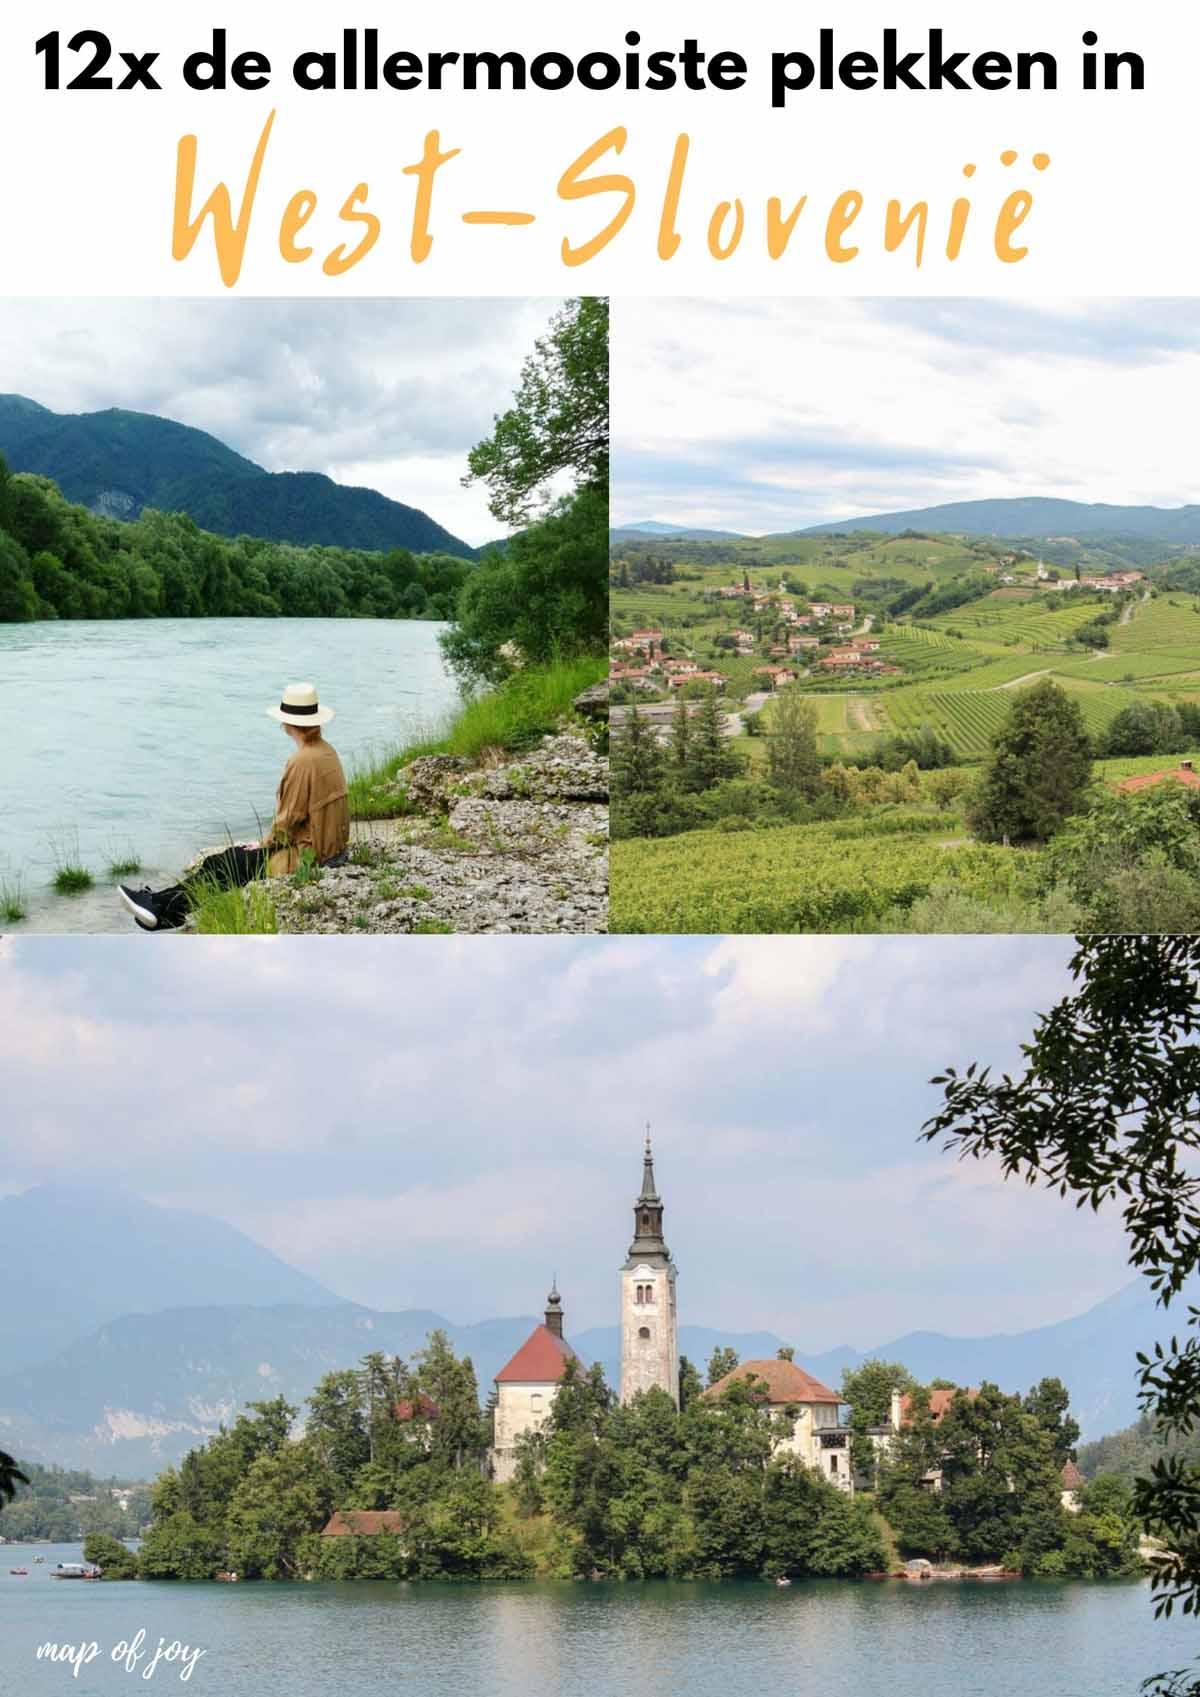 12x de allermooiste plekken in West-Slovenië (en tips om er te doen) - Map of Joy